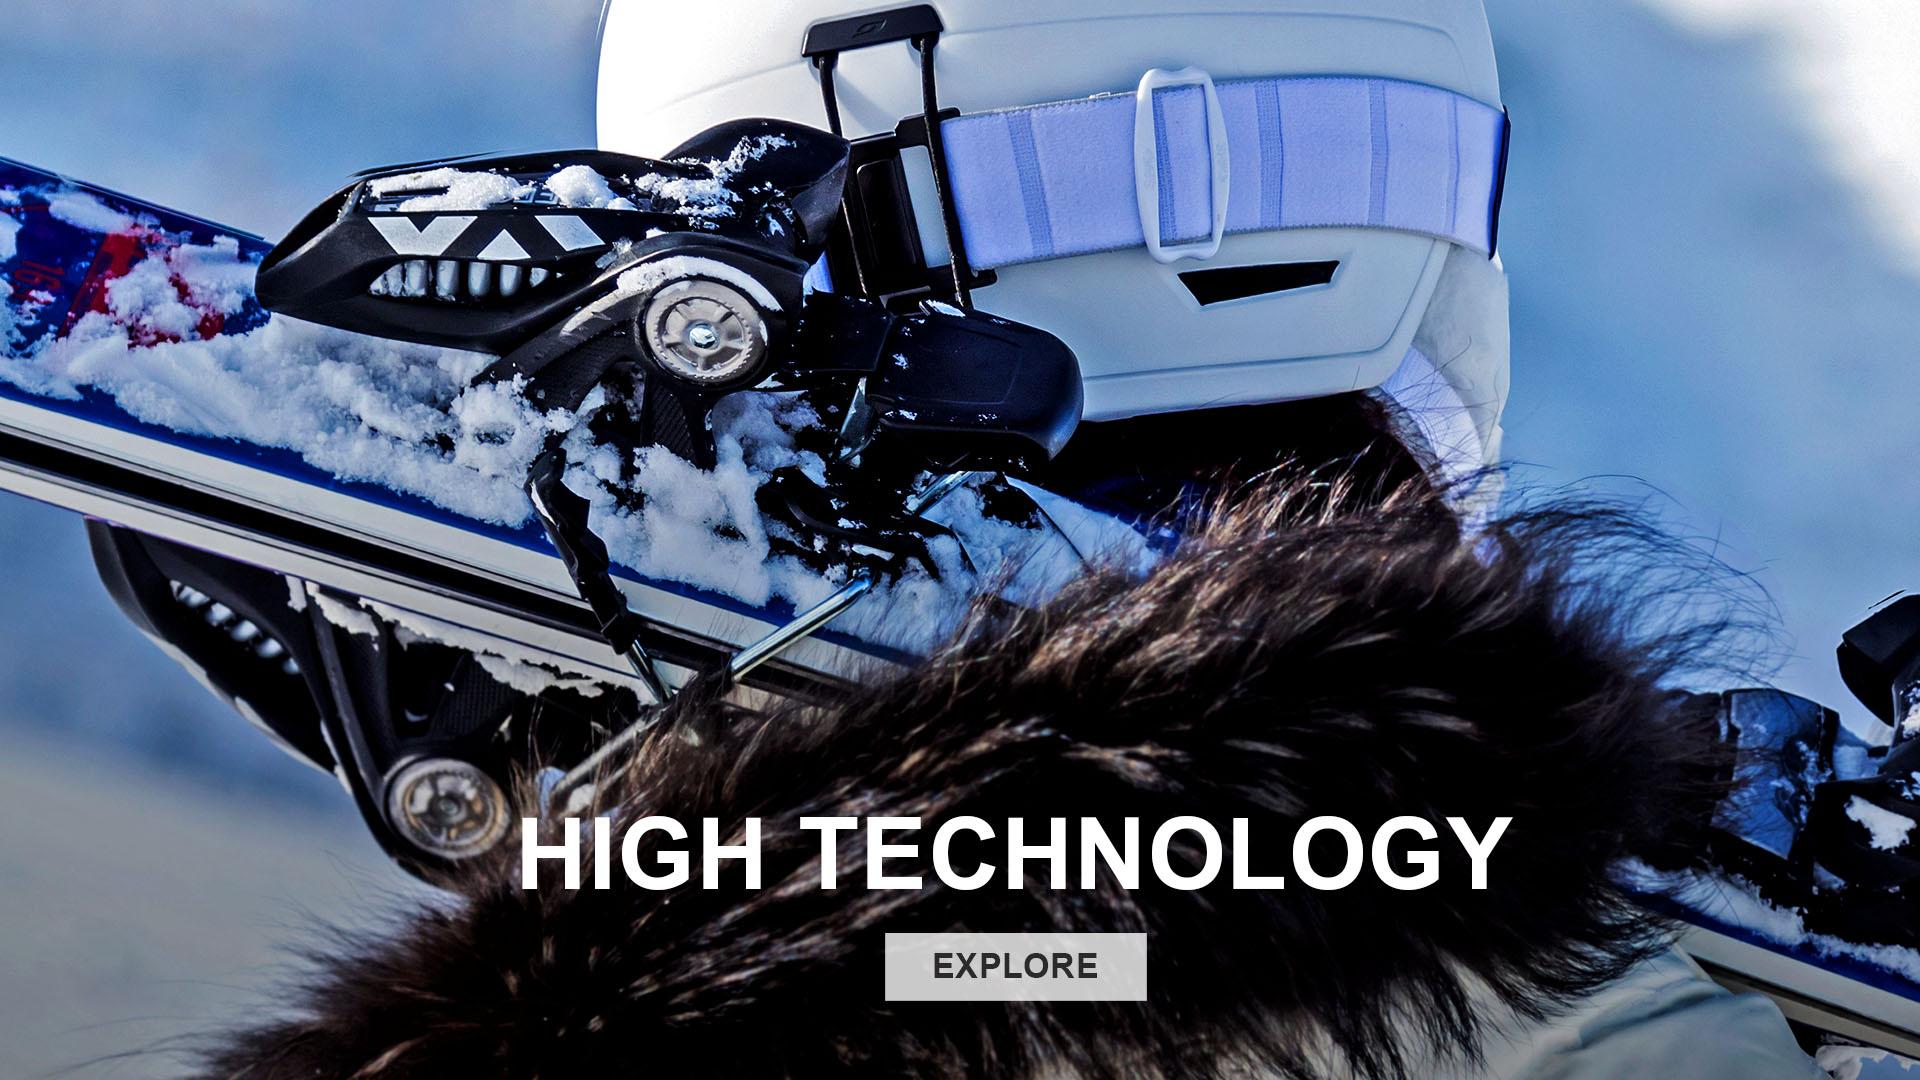 HIGH TECHNOLOGY 高科技 滑雪頭盔 滑雪安全帽